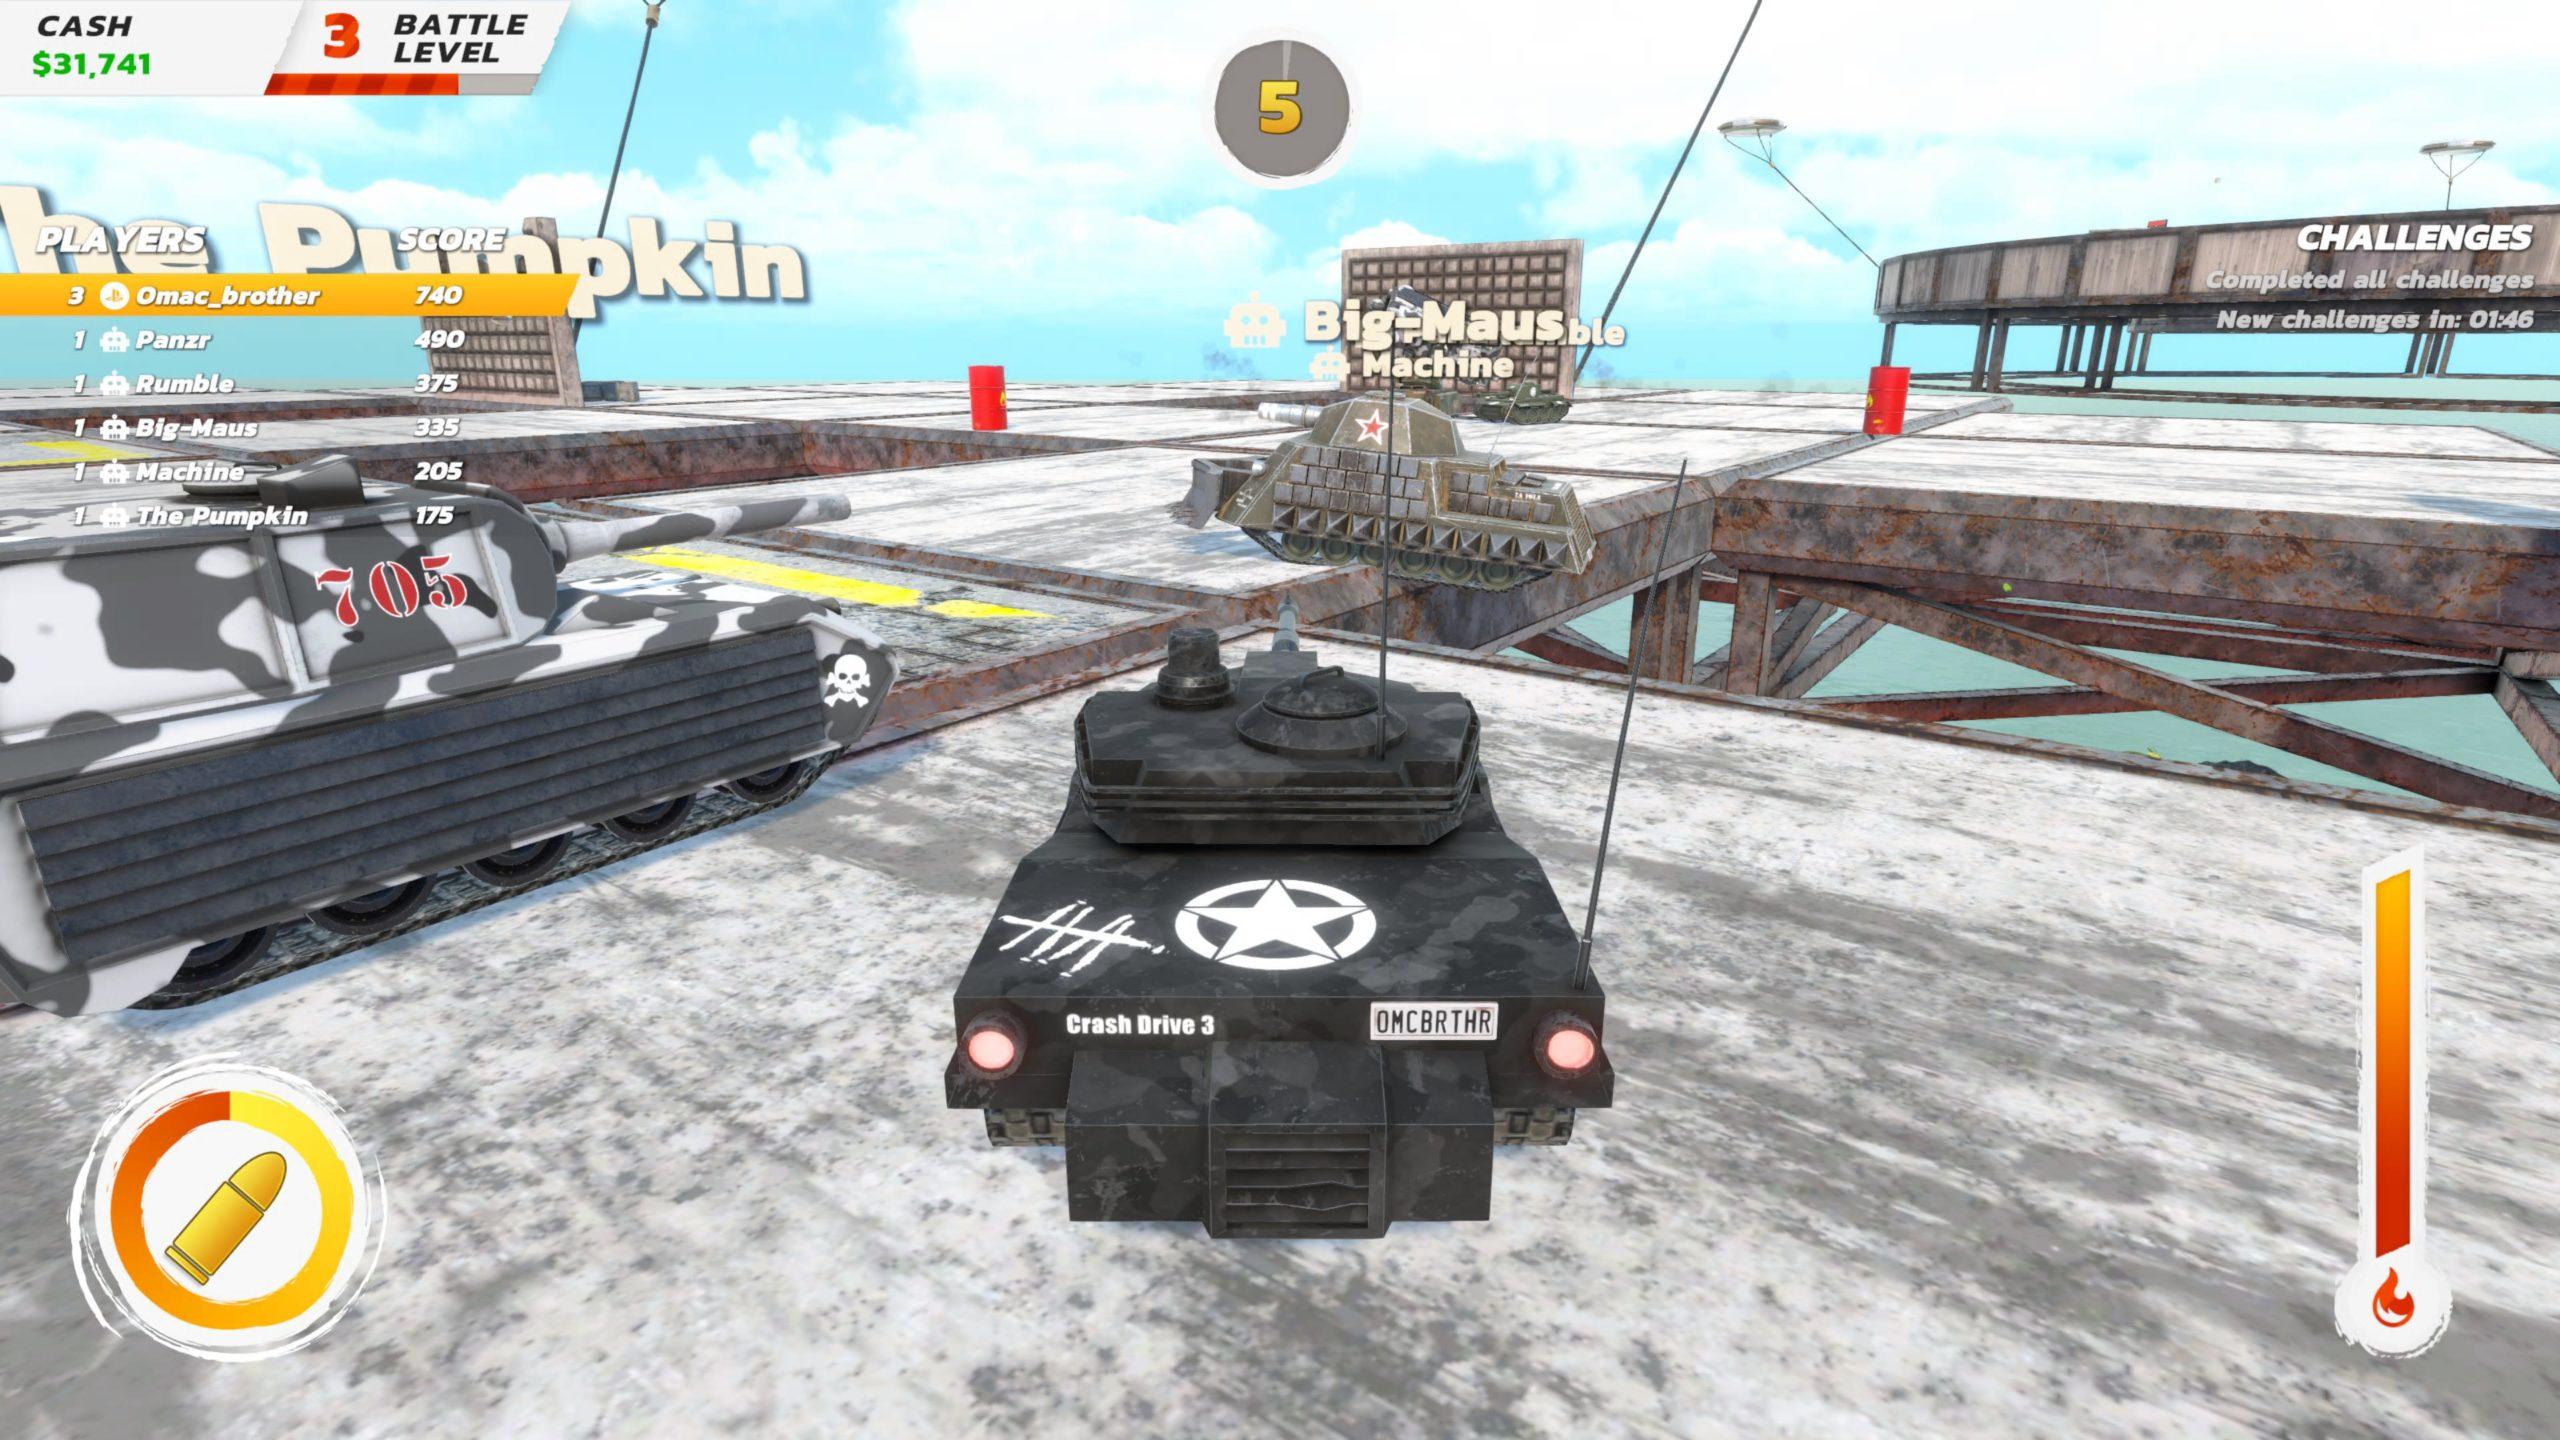 Crash Drive 3 tanks